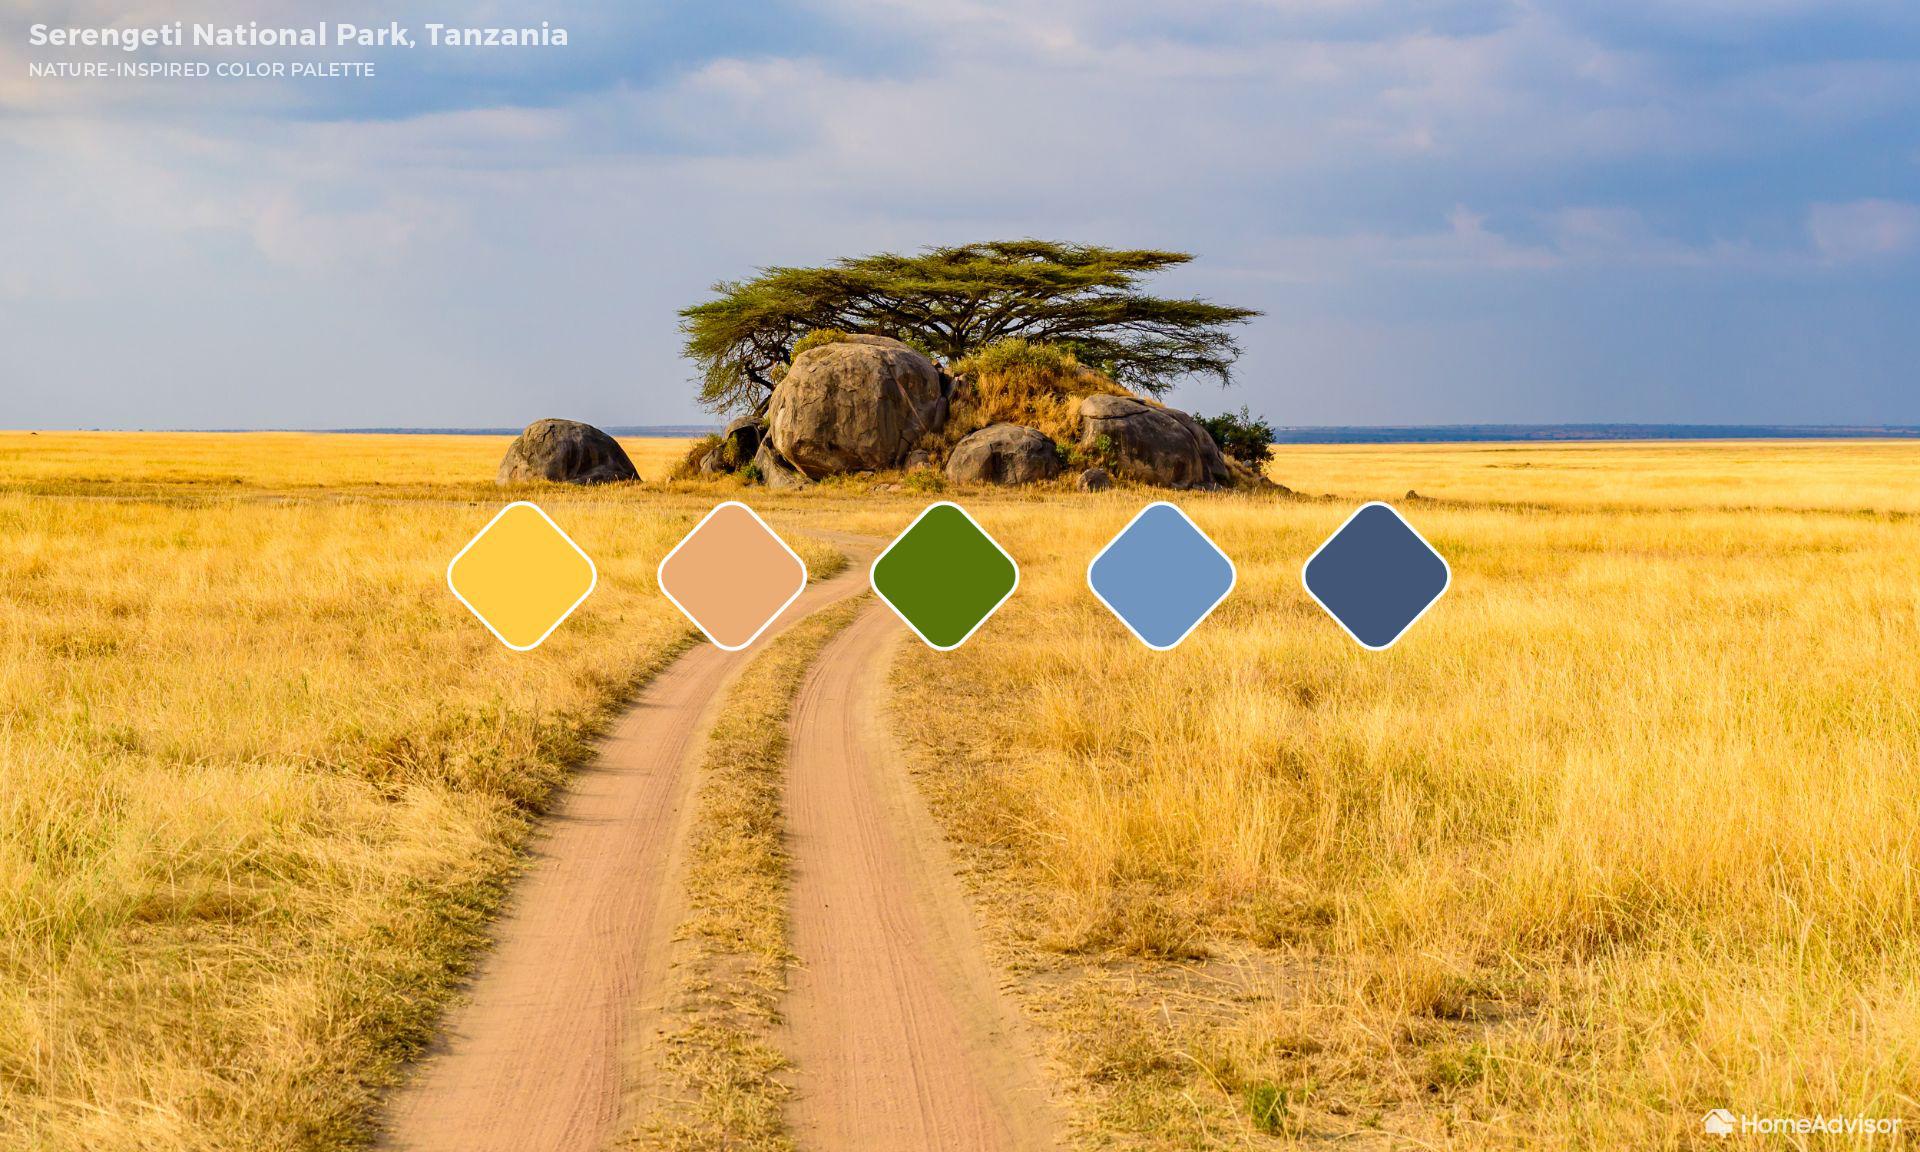 6. Serengeti National Park (Tanzânia)